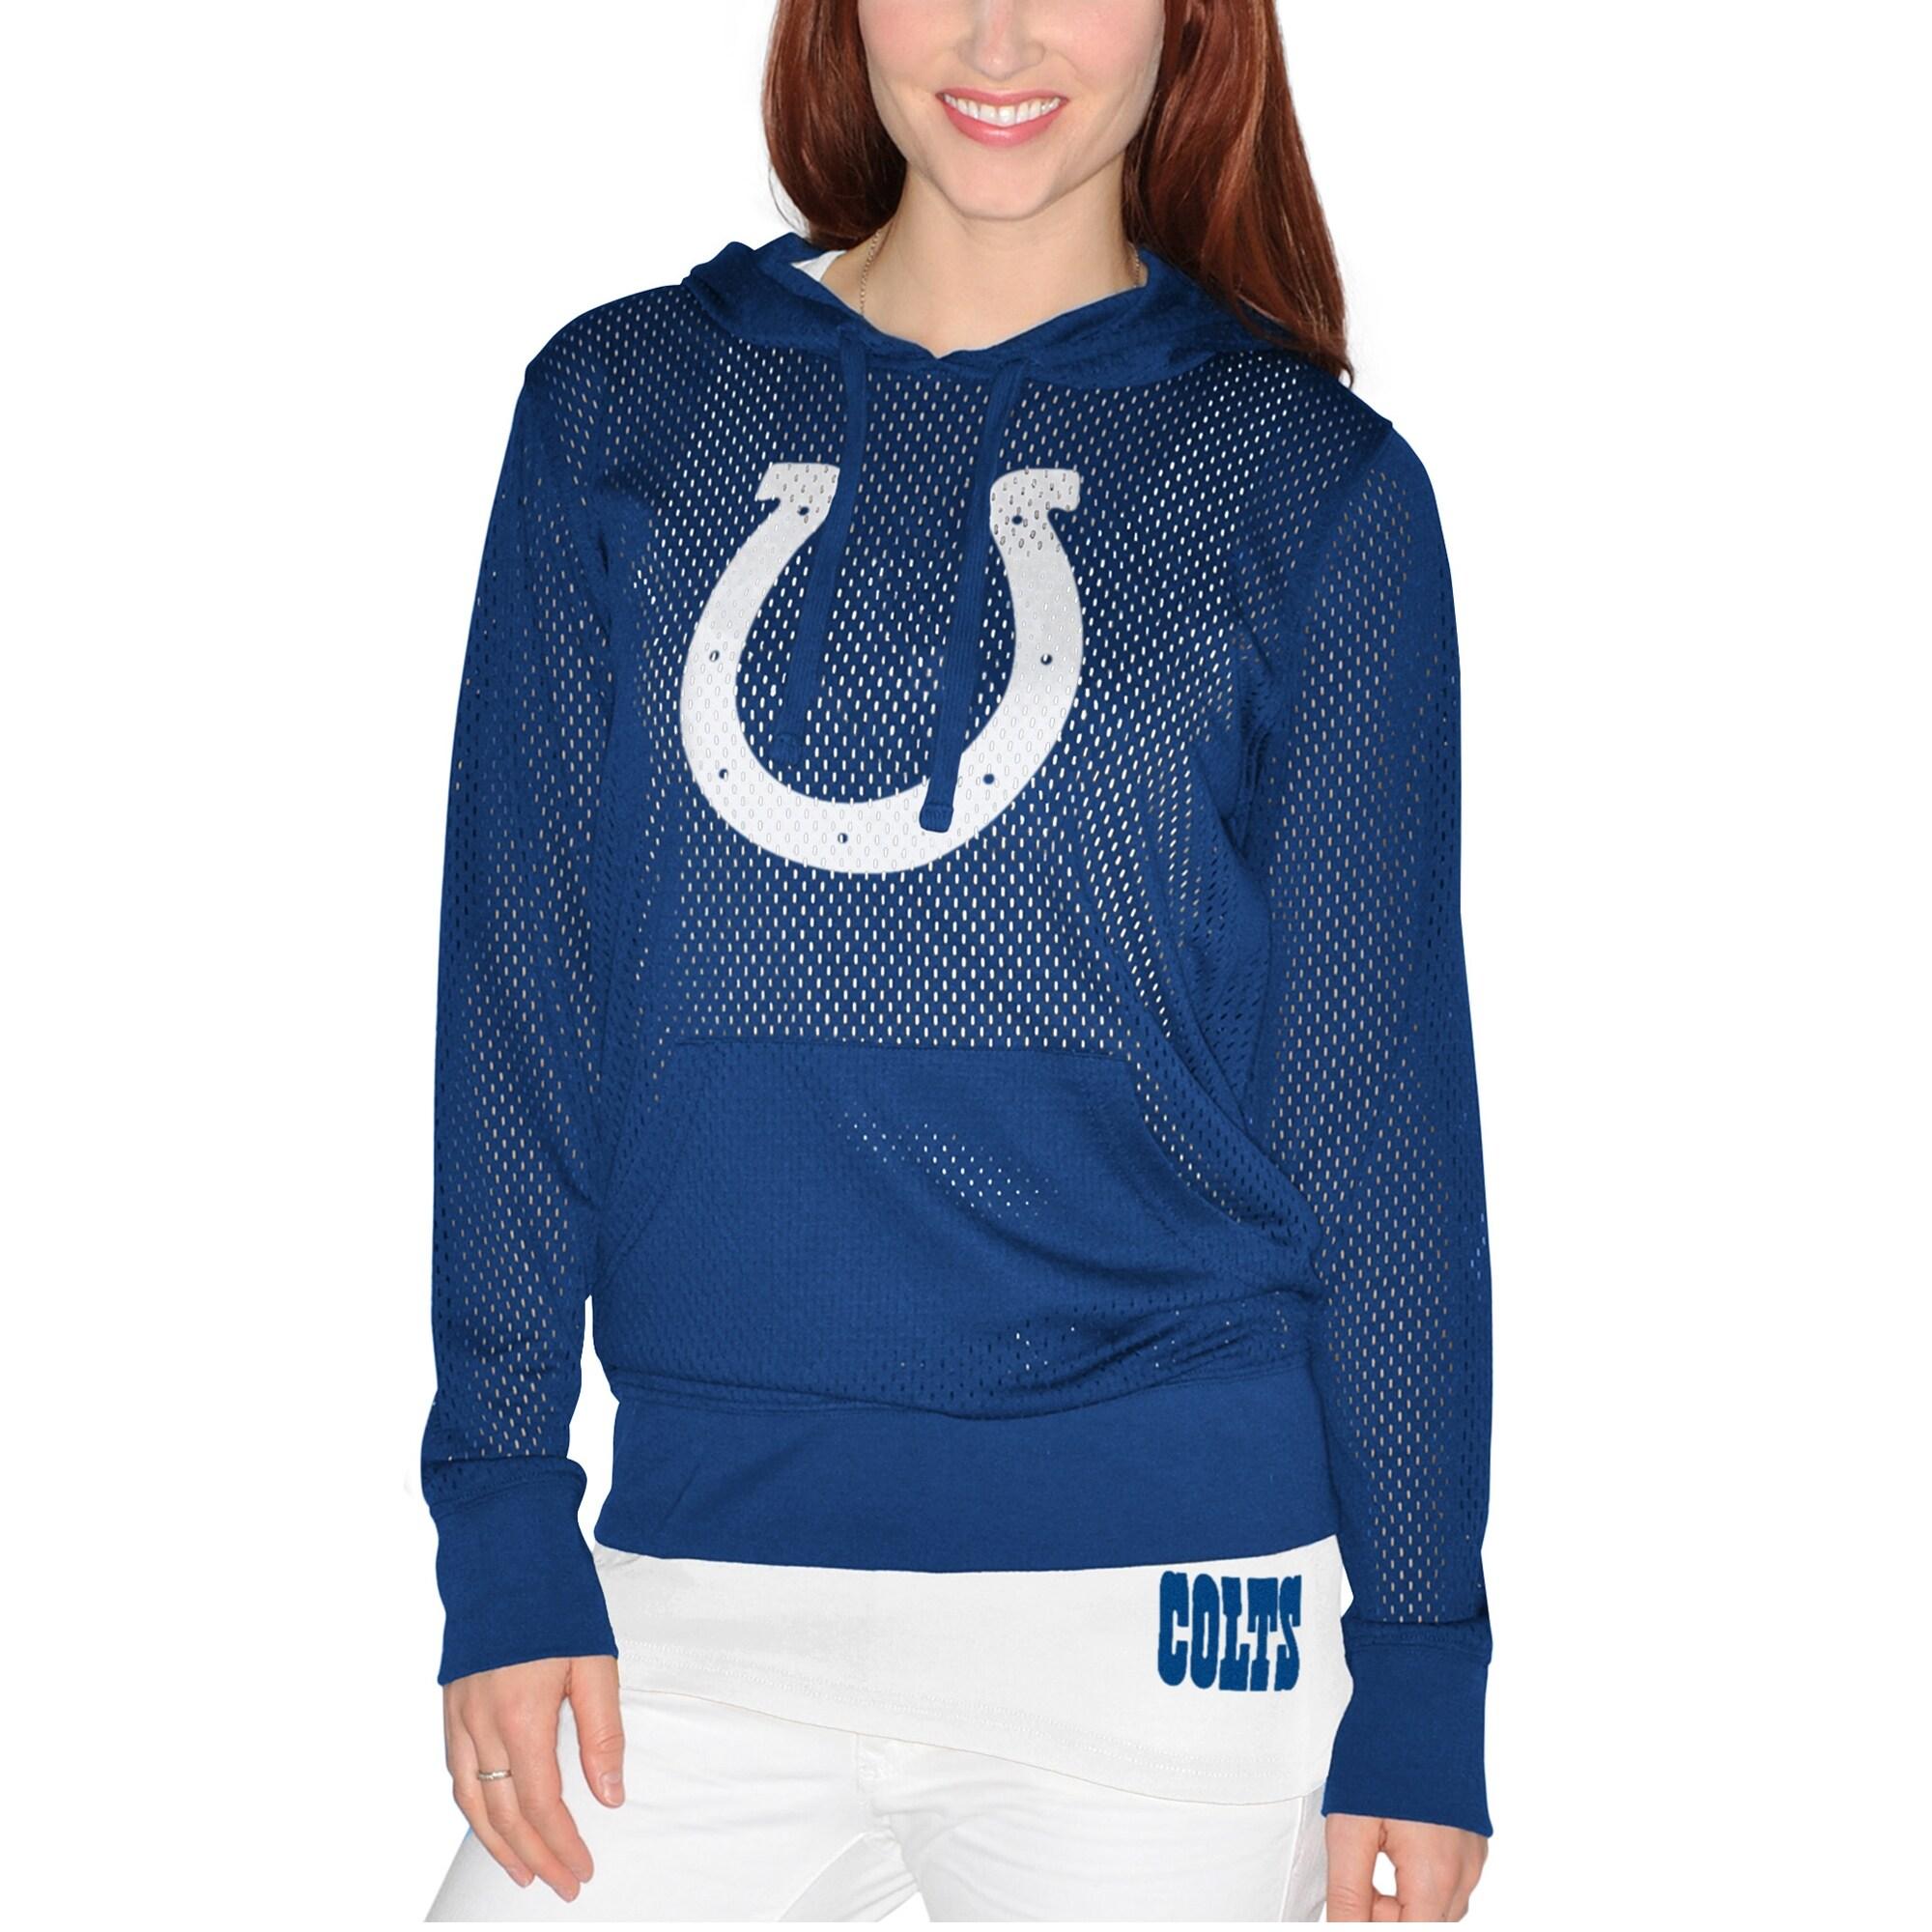 Indianapolis Colts Women's Holey Hoodie T-Shirt & Tank Top Set - Royal